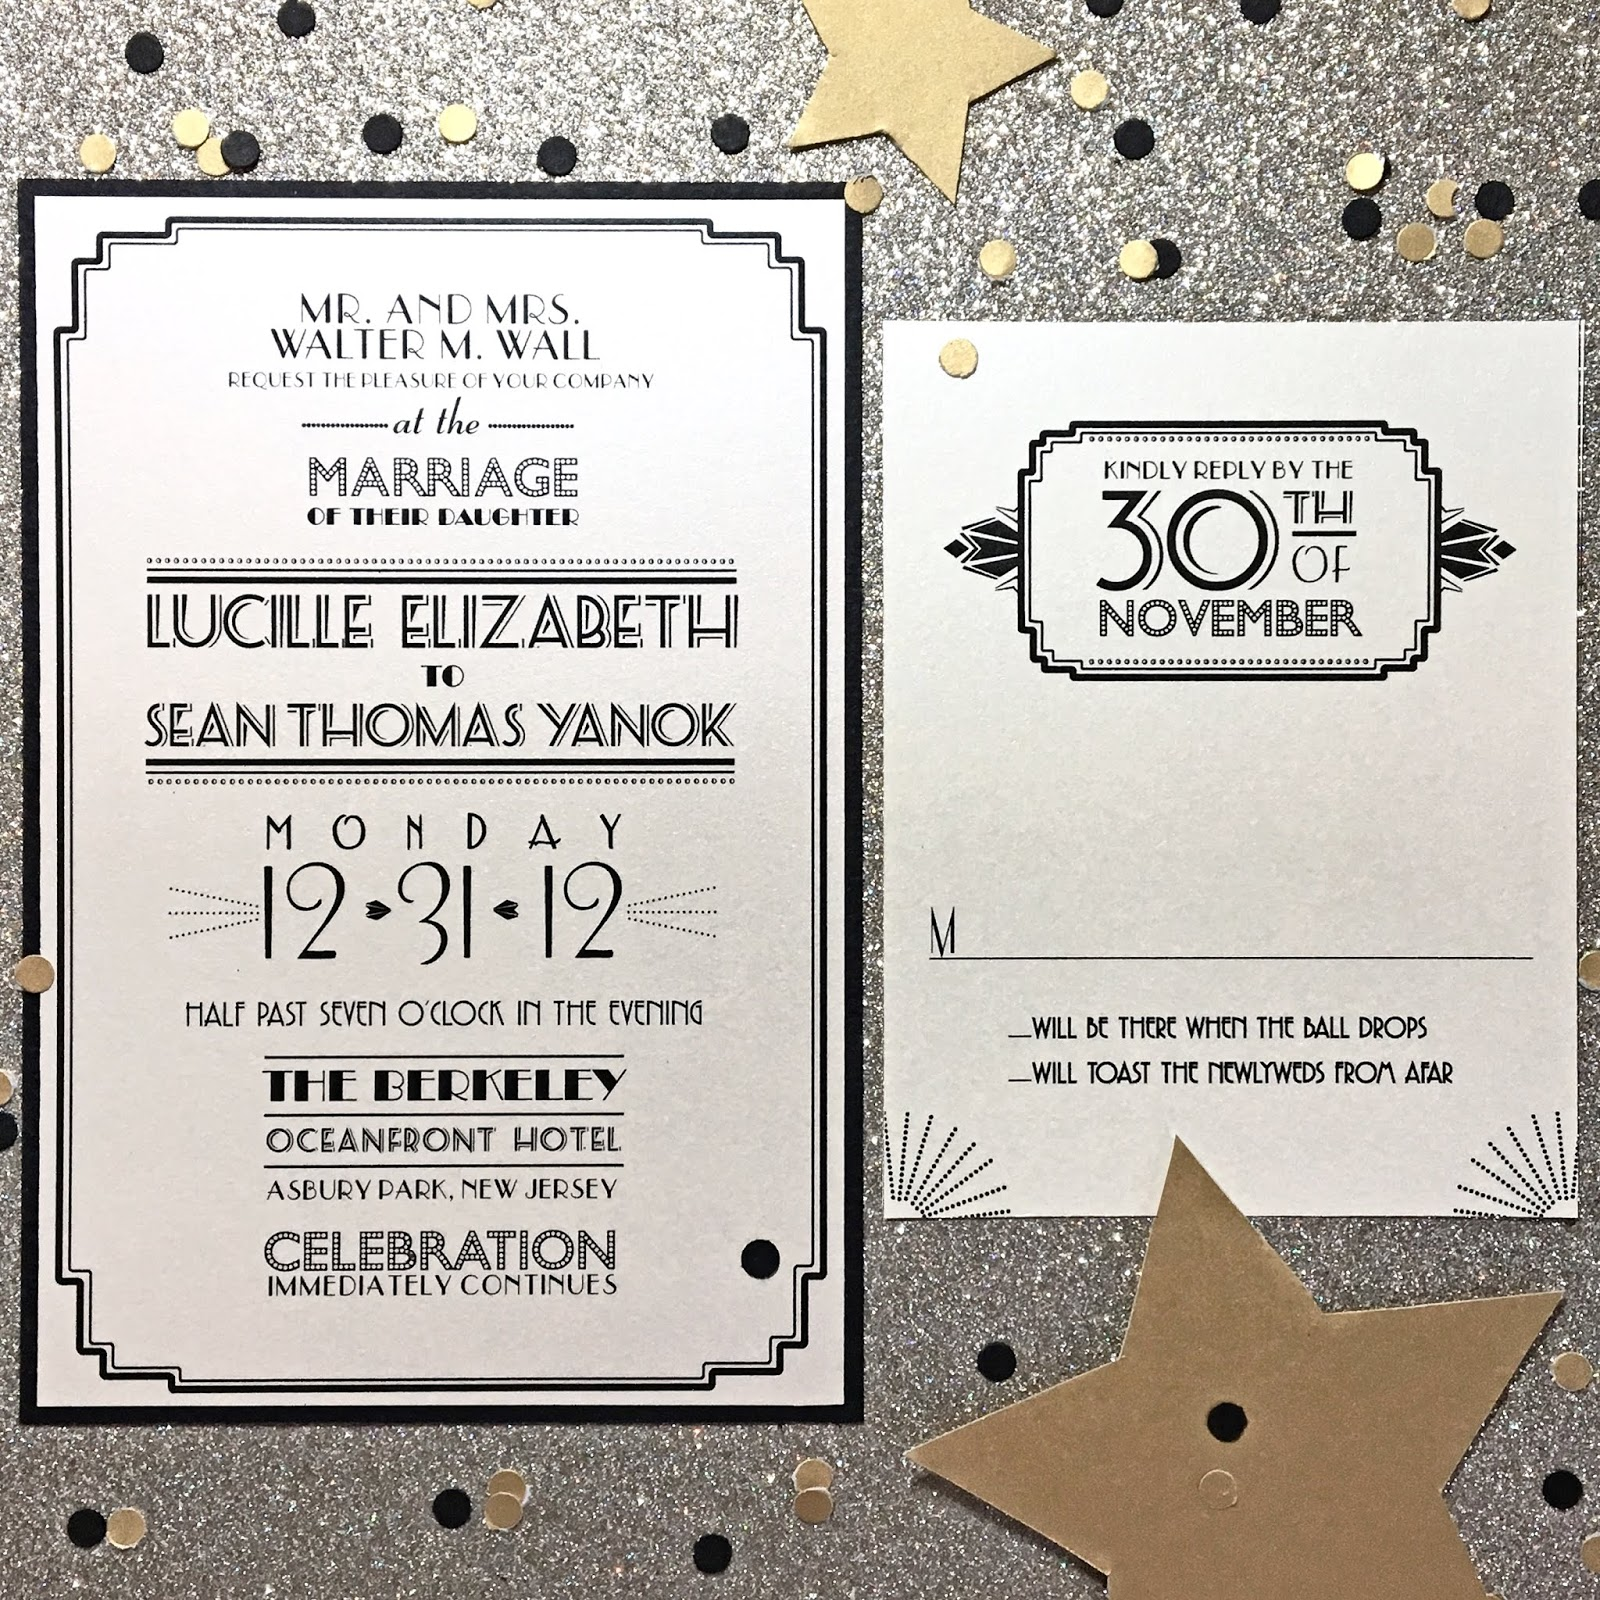 Art Deco Wedding Invitation: Invitations, Ink, Social Design Studio: New Year's Eve Art